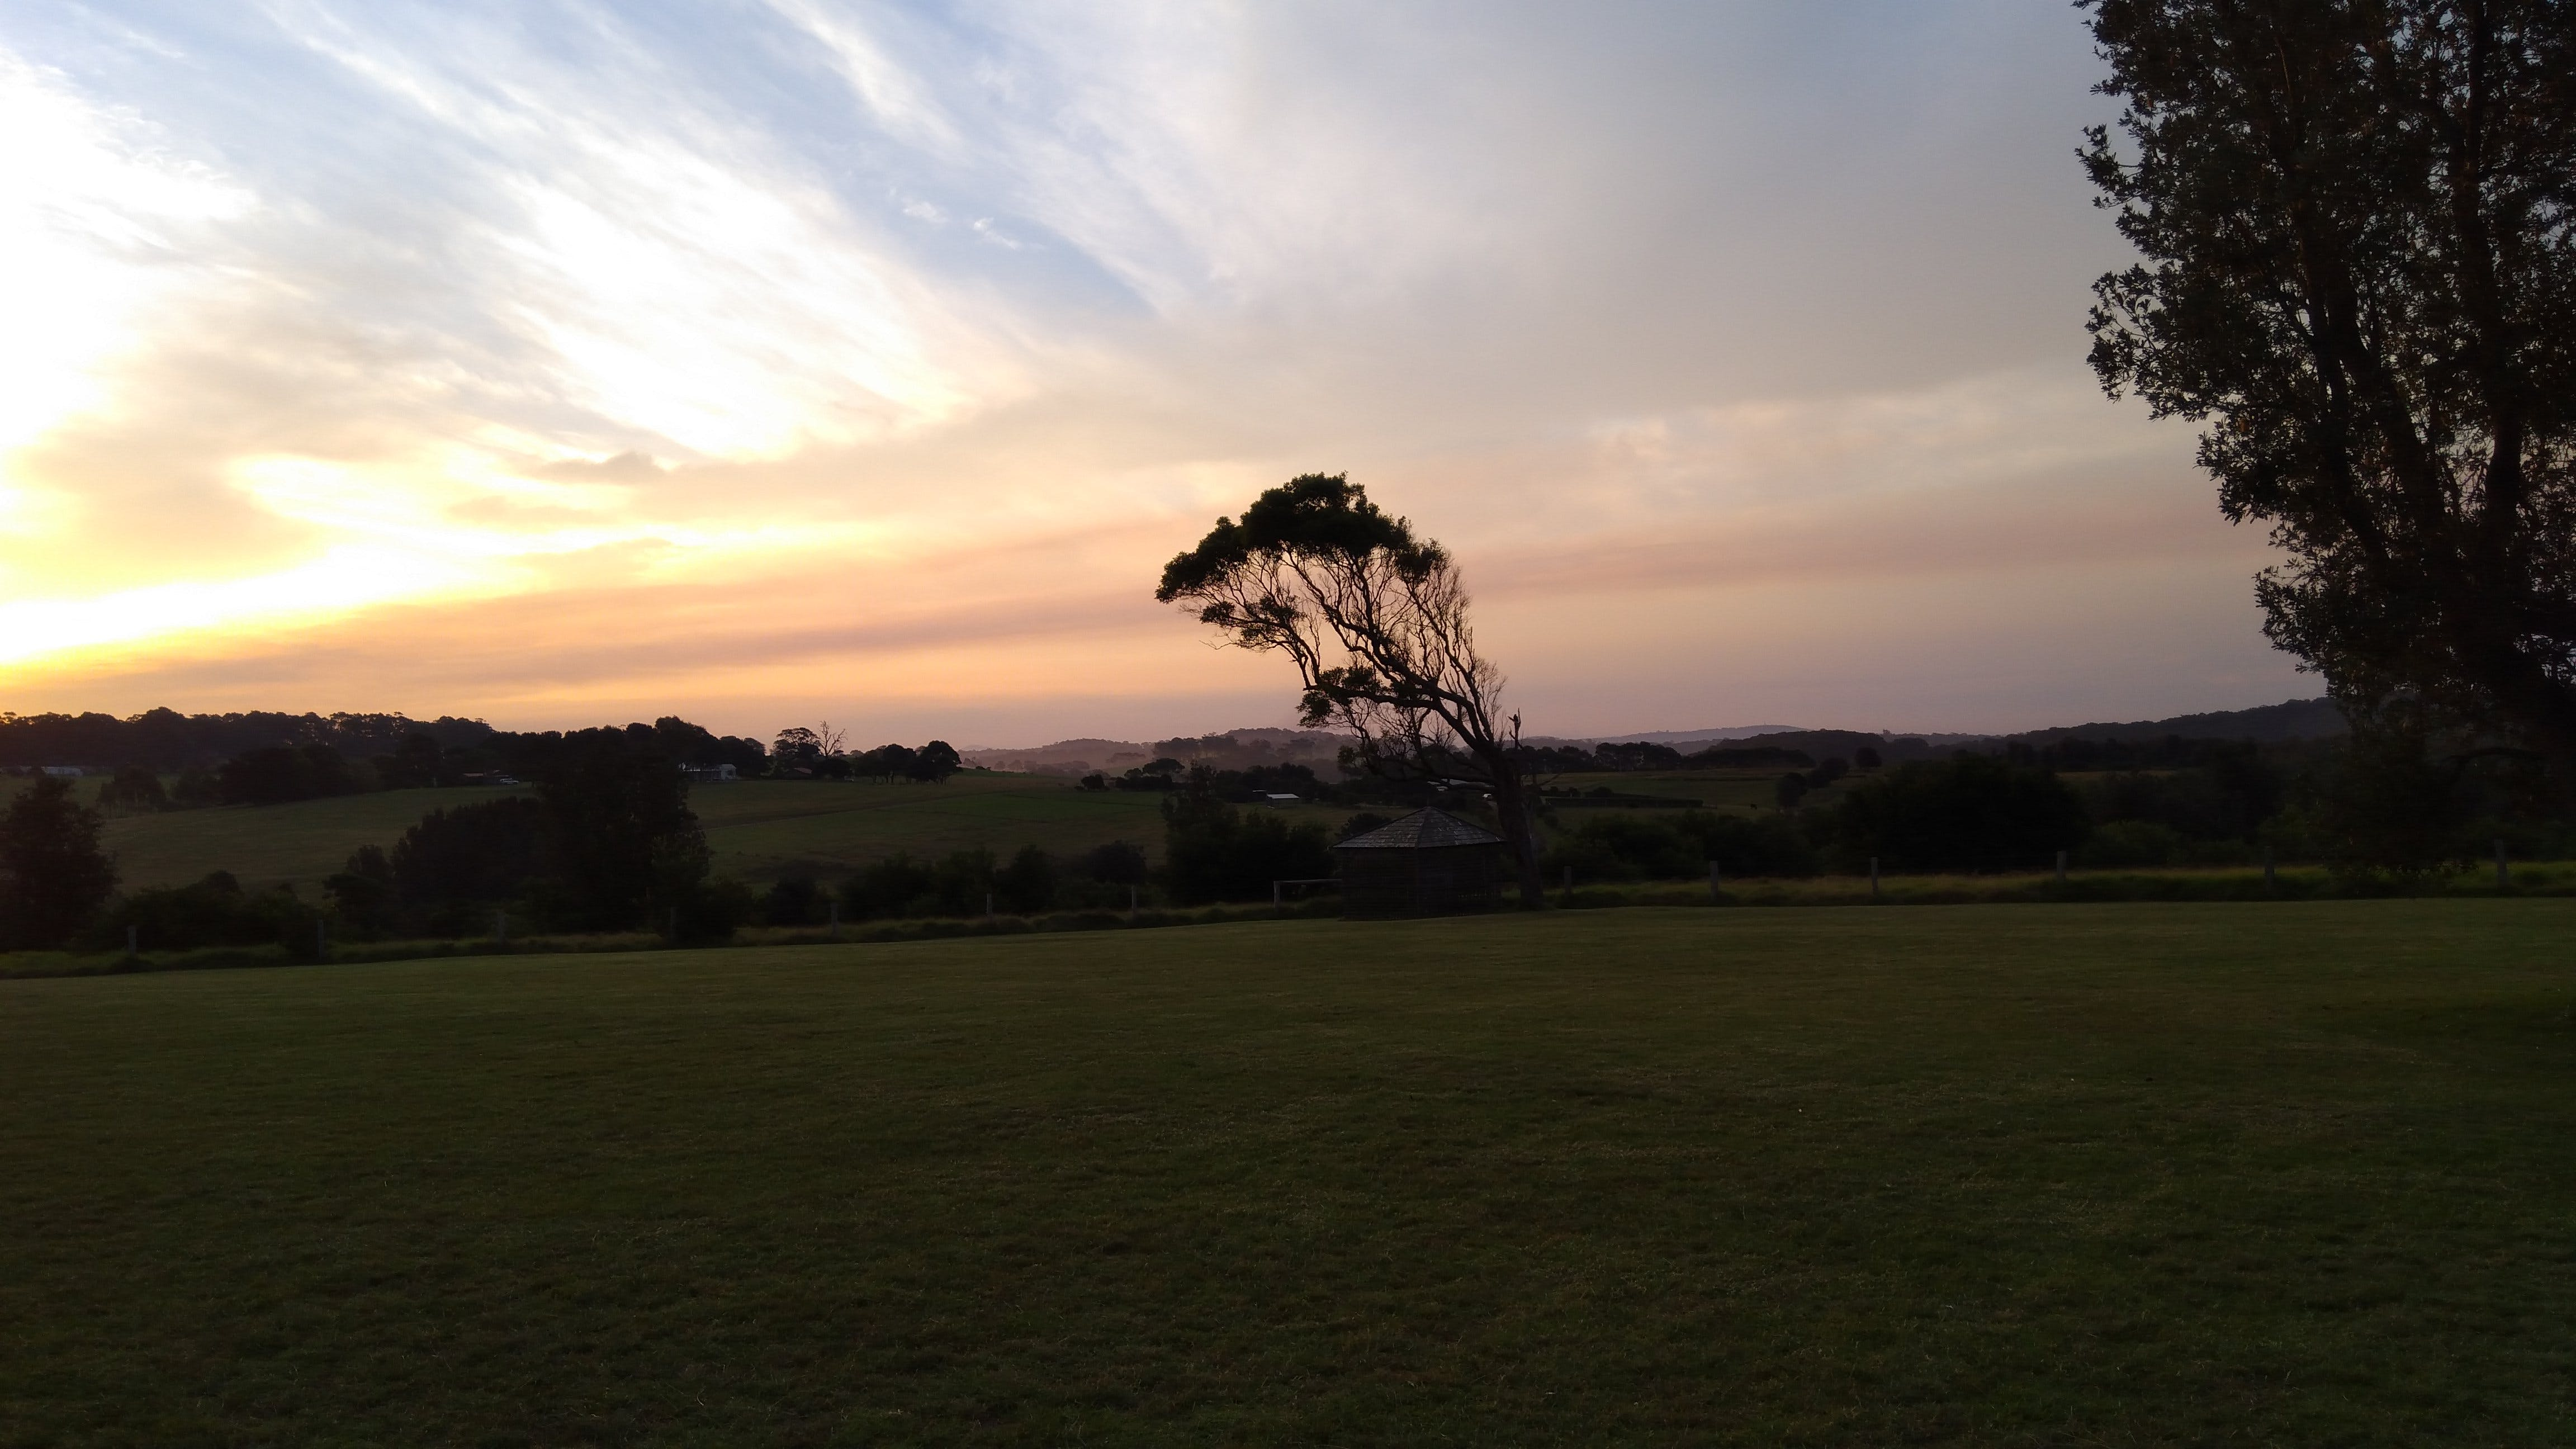 Free stock photo of golden sunset, nature, tree